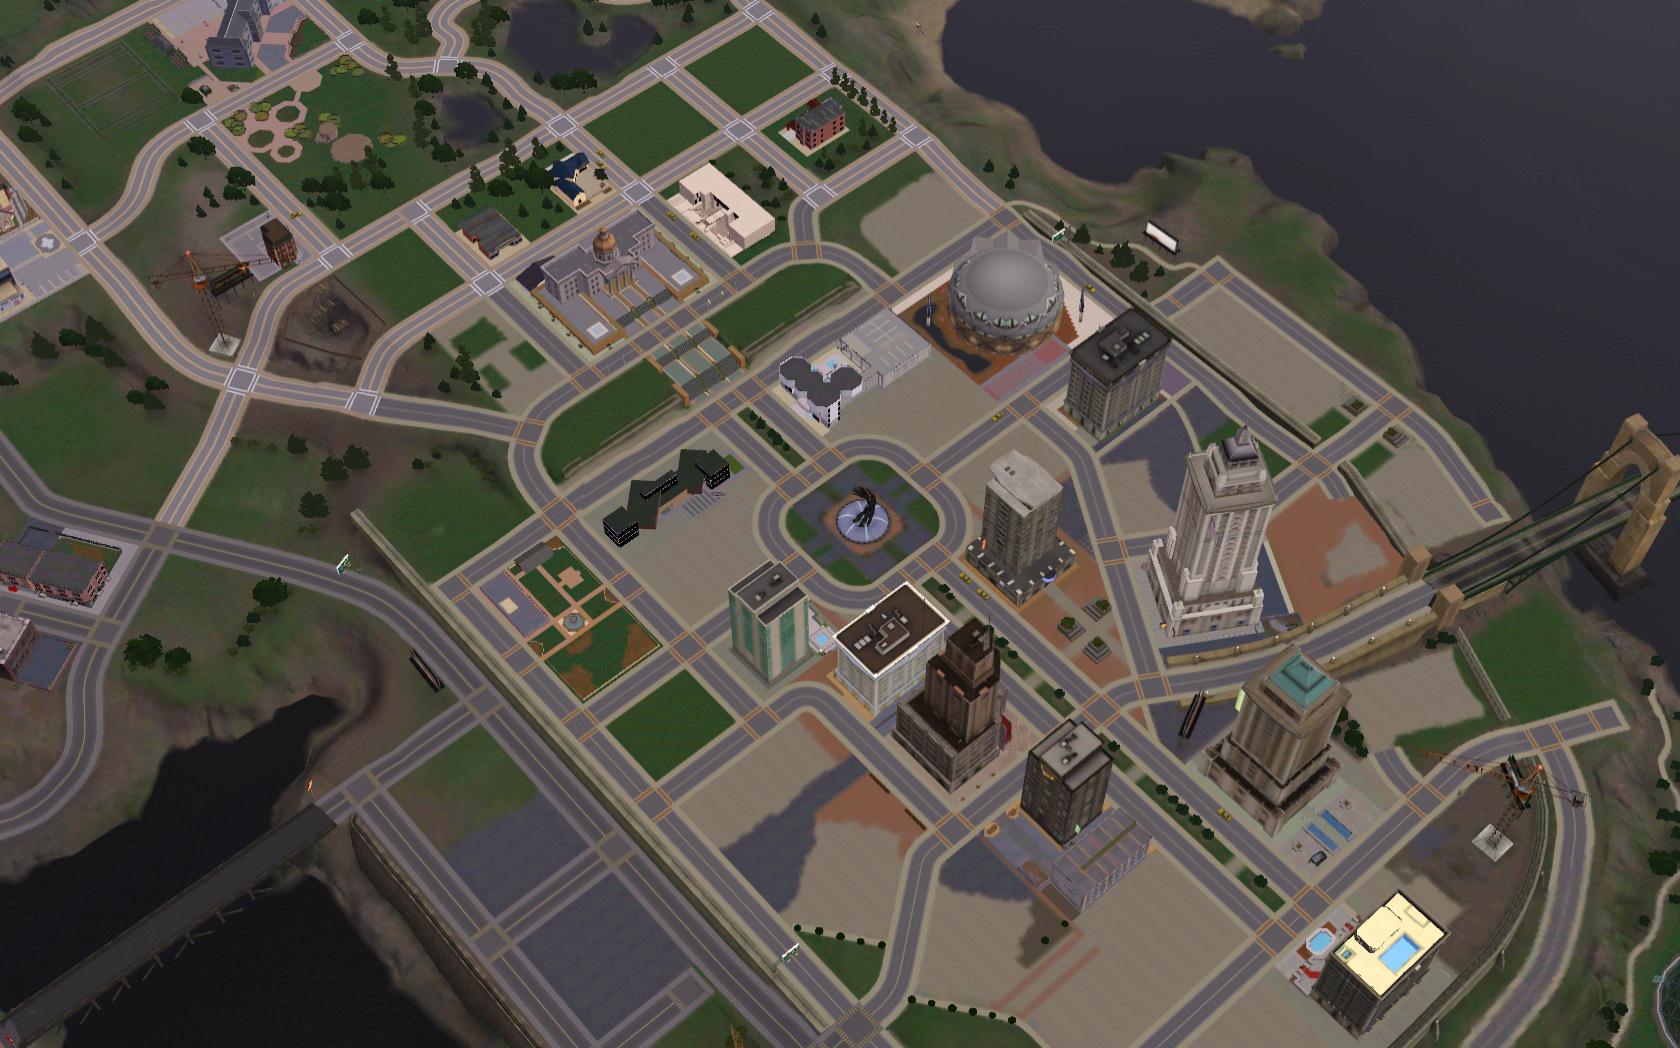 Mod the sims bridgeport emptied 4 more publicscrutiny Gallery